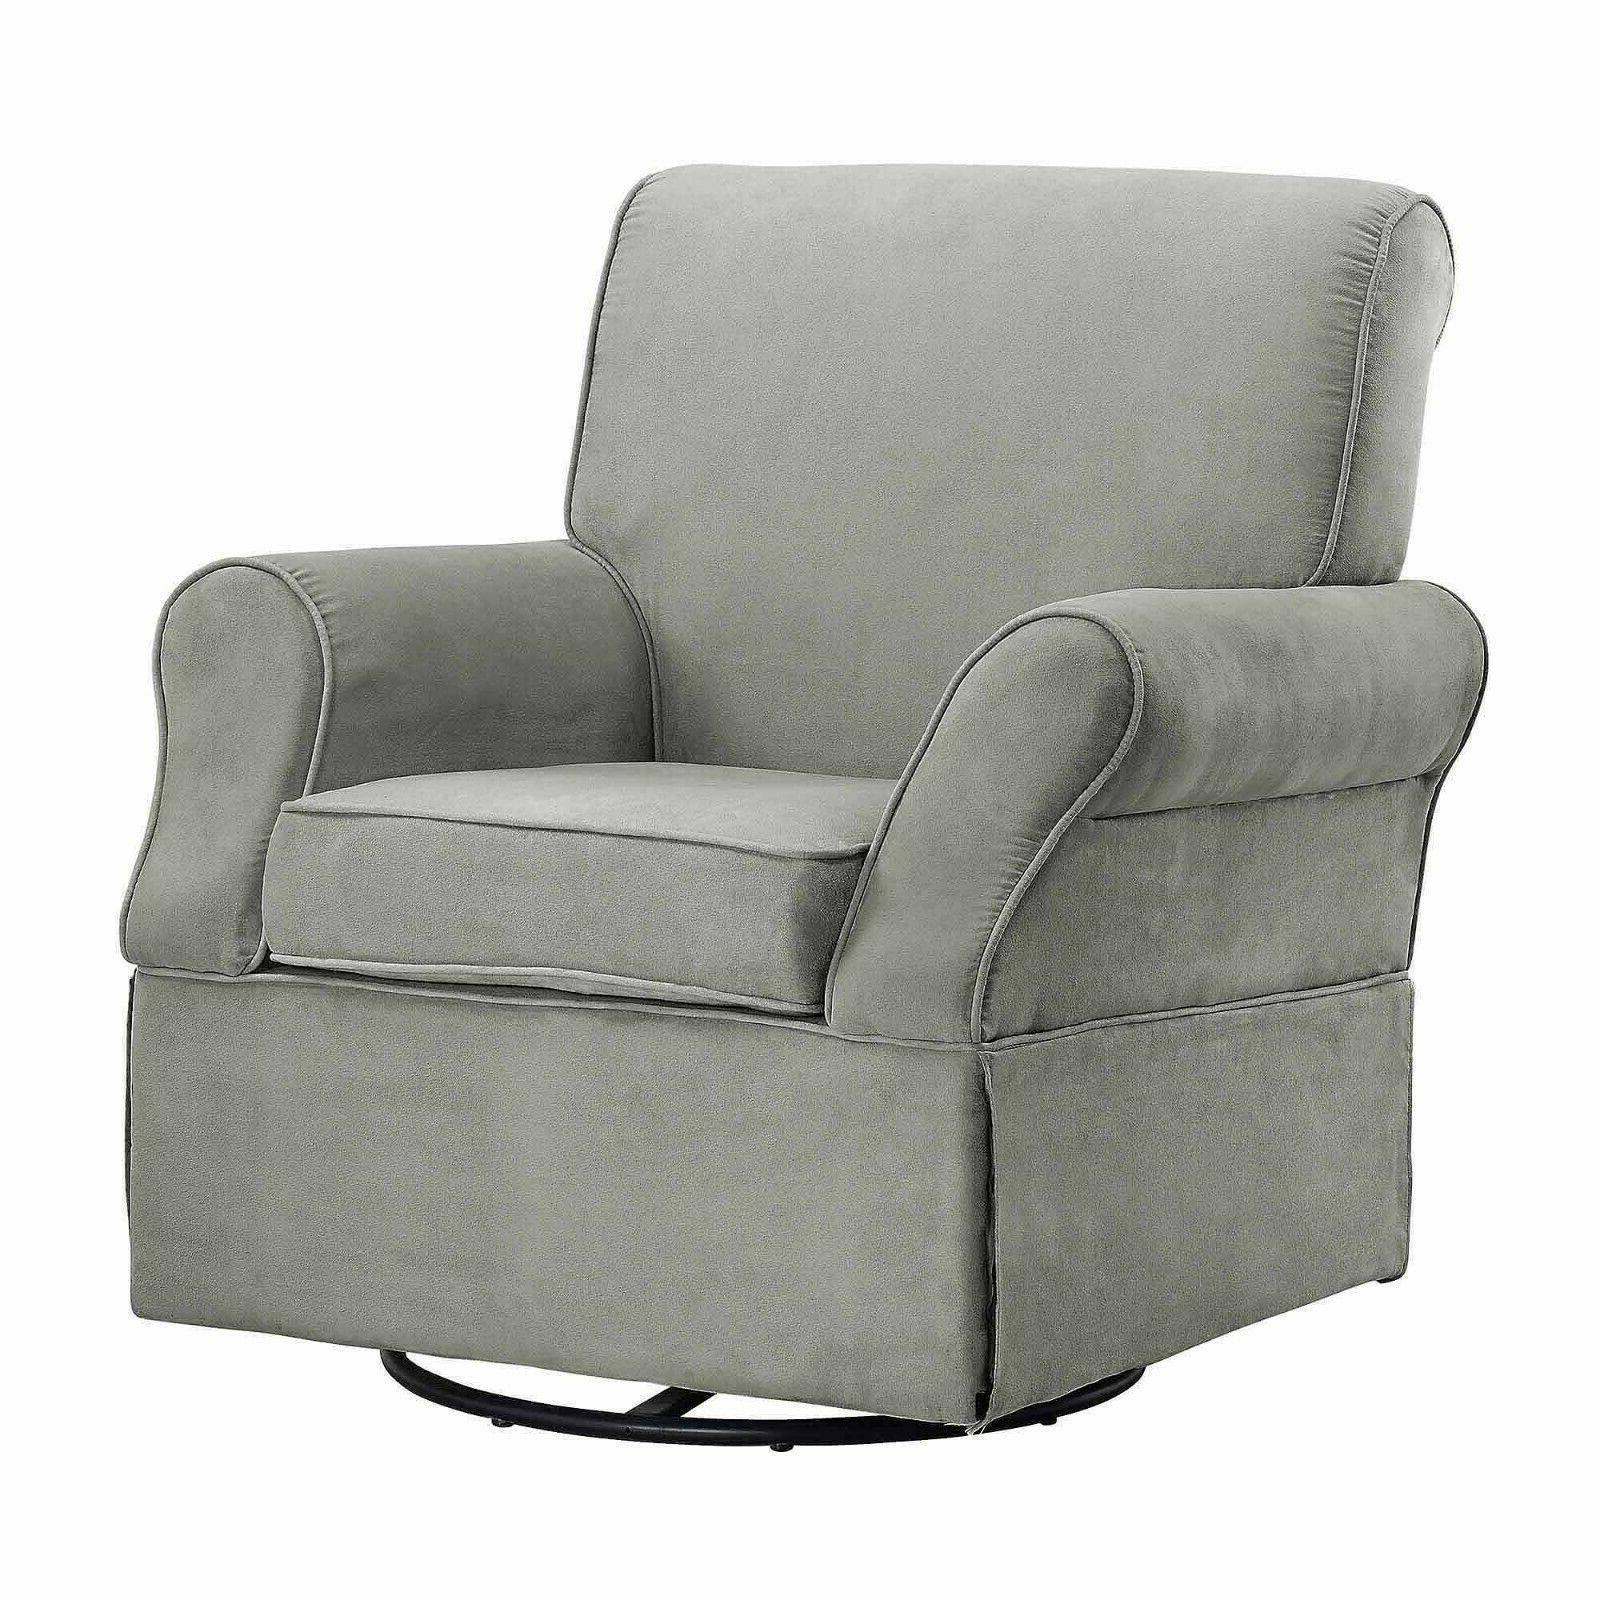 Nursery Glider Chair Swivel Nursing Lounge Home Furniture